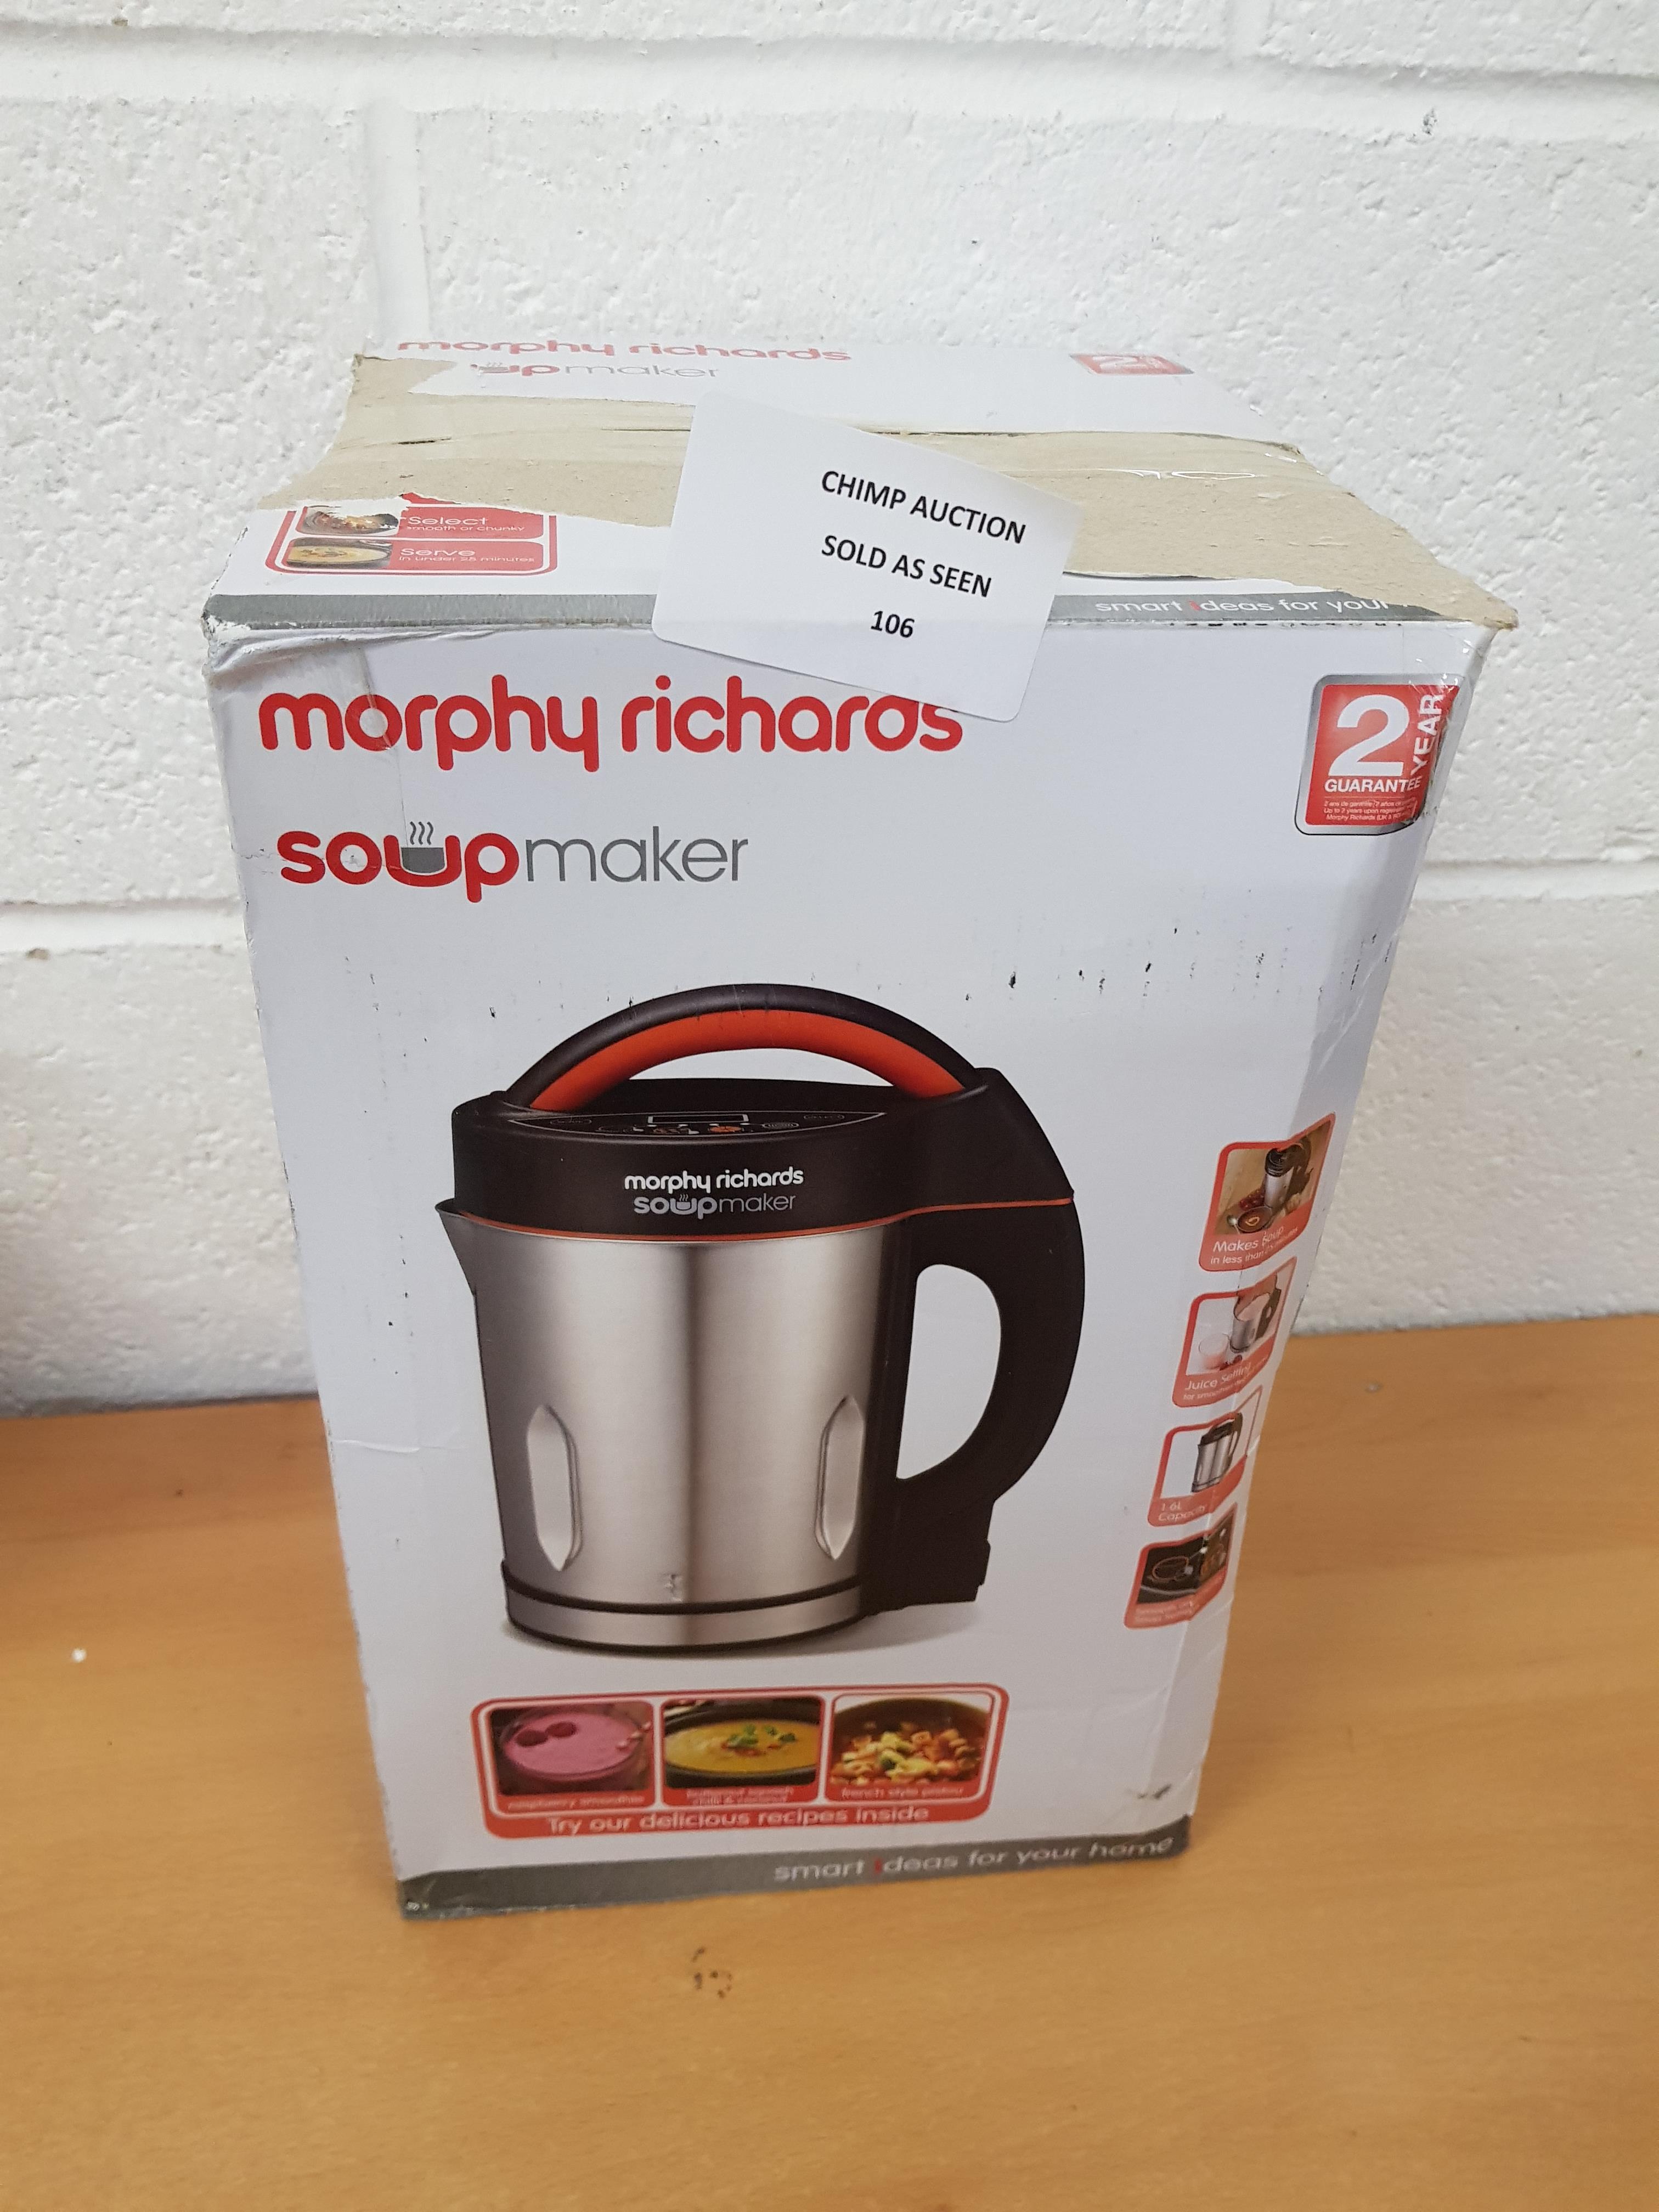 Lot 106 - Morphy Richards Soup Maker